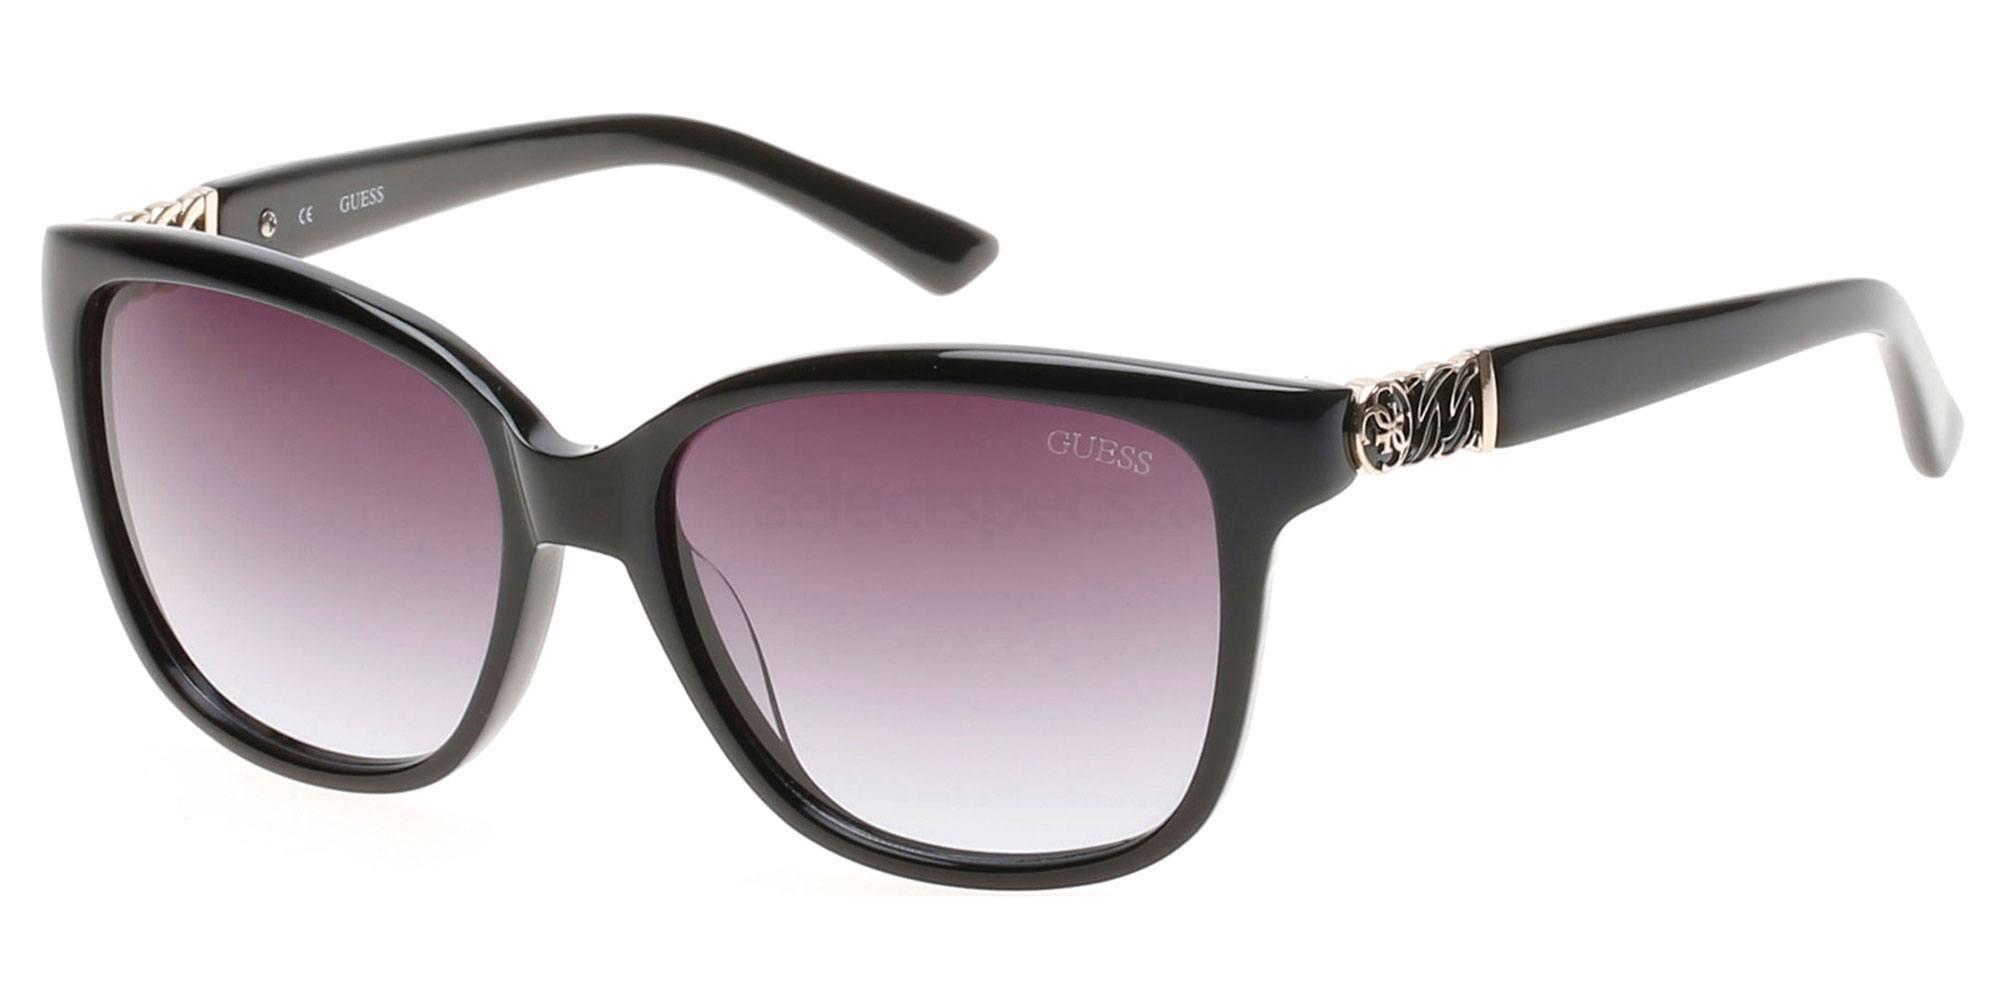 01B GU7385 Sunglasses, Guess